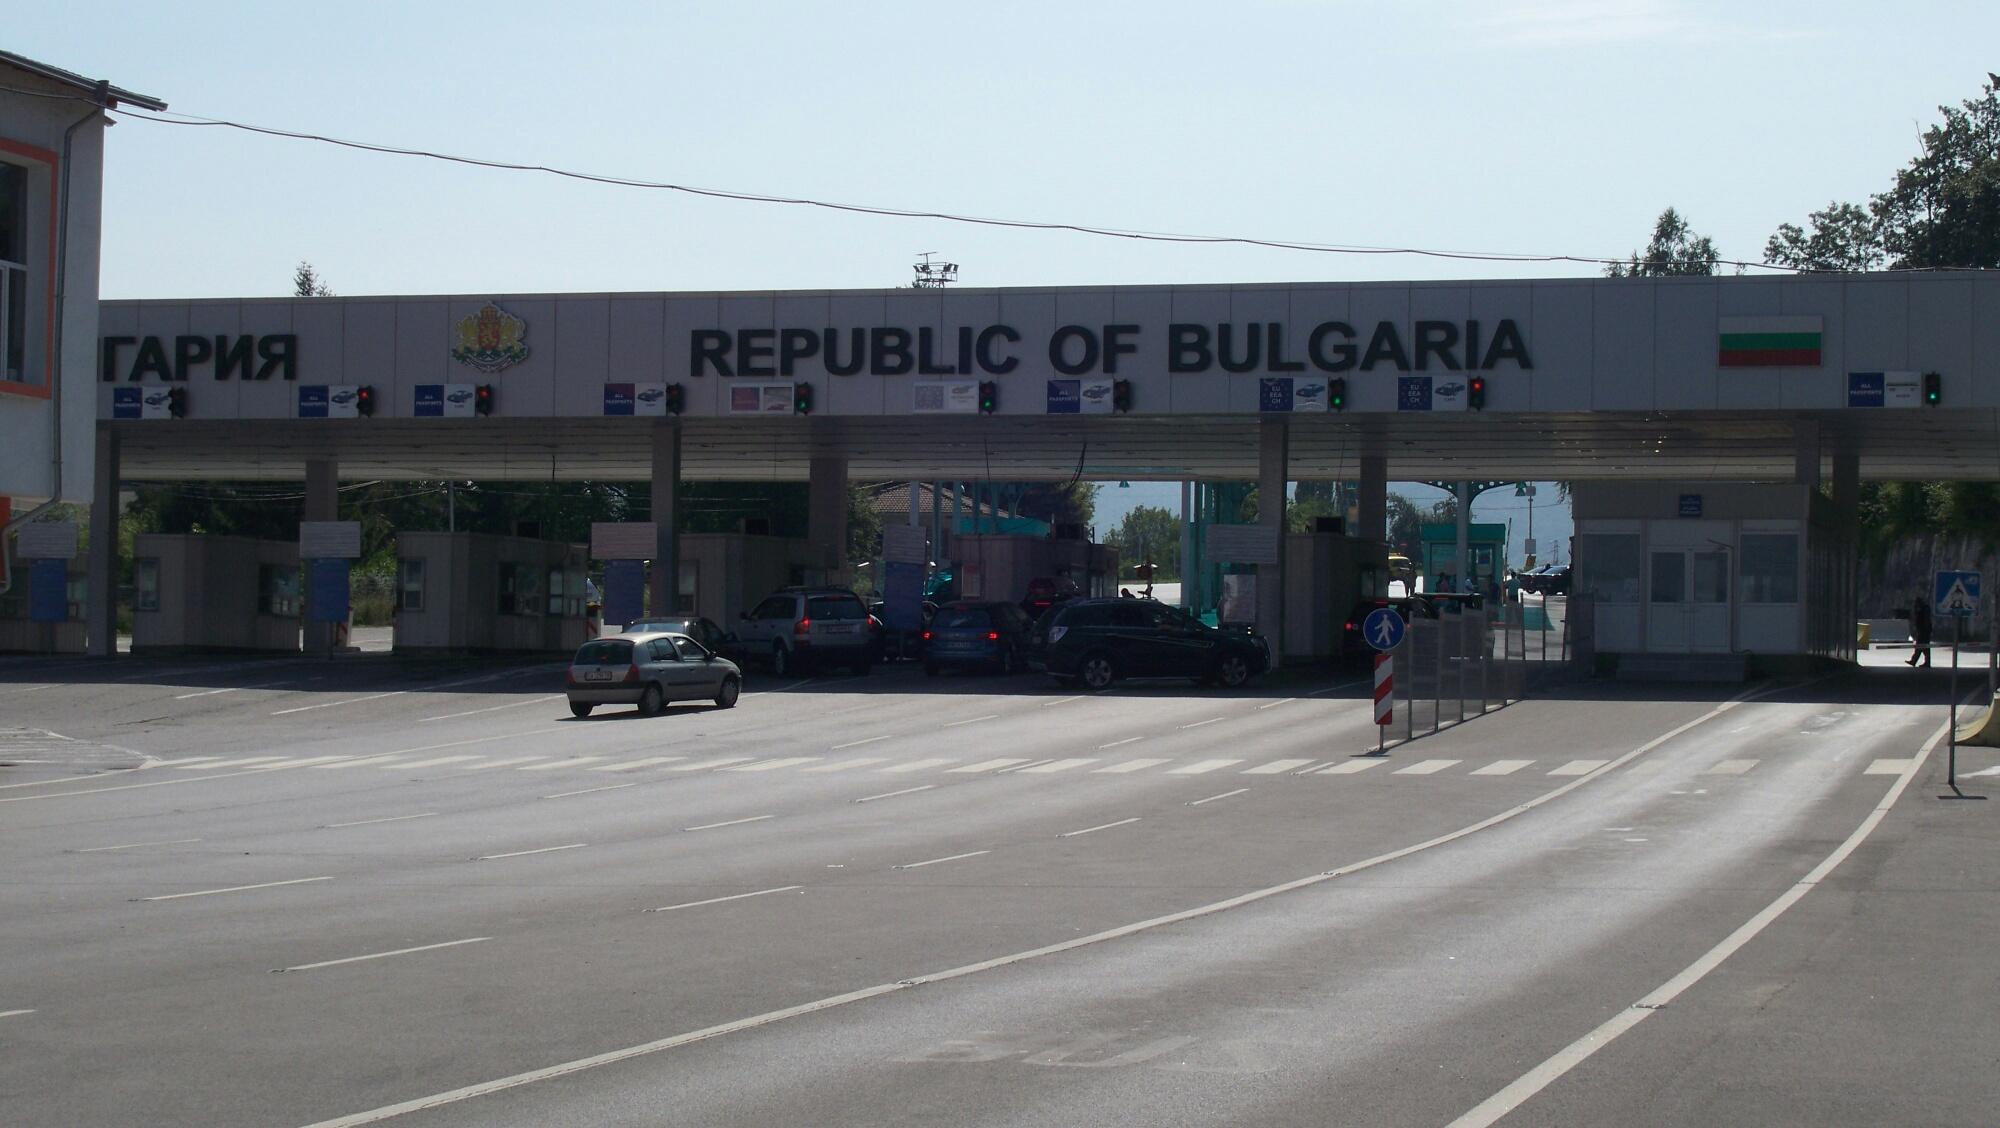 Silayolu:Bulgaristan diger sinir kapilari